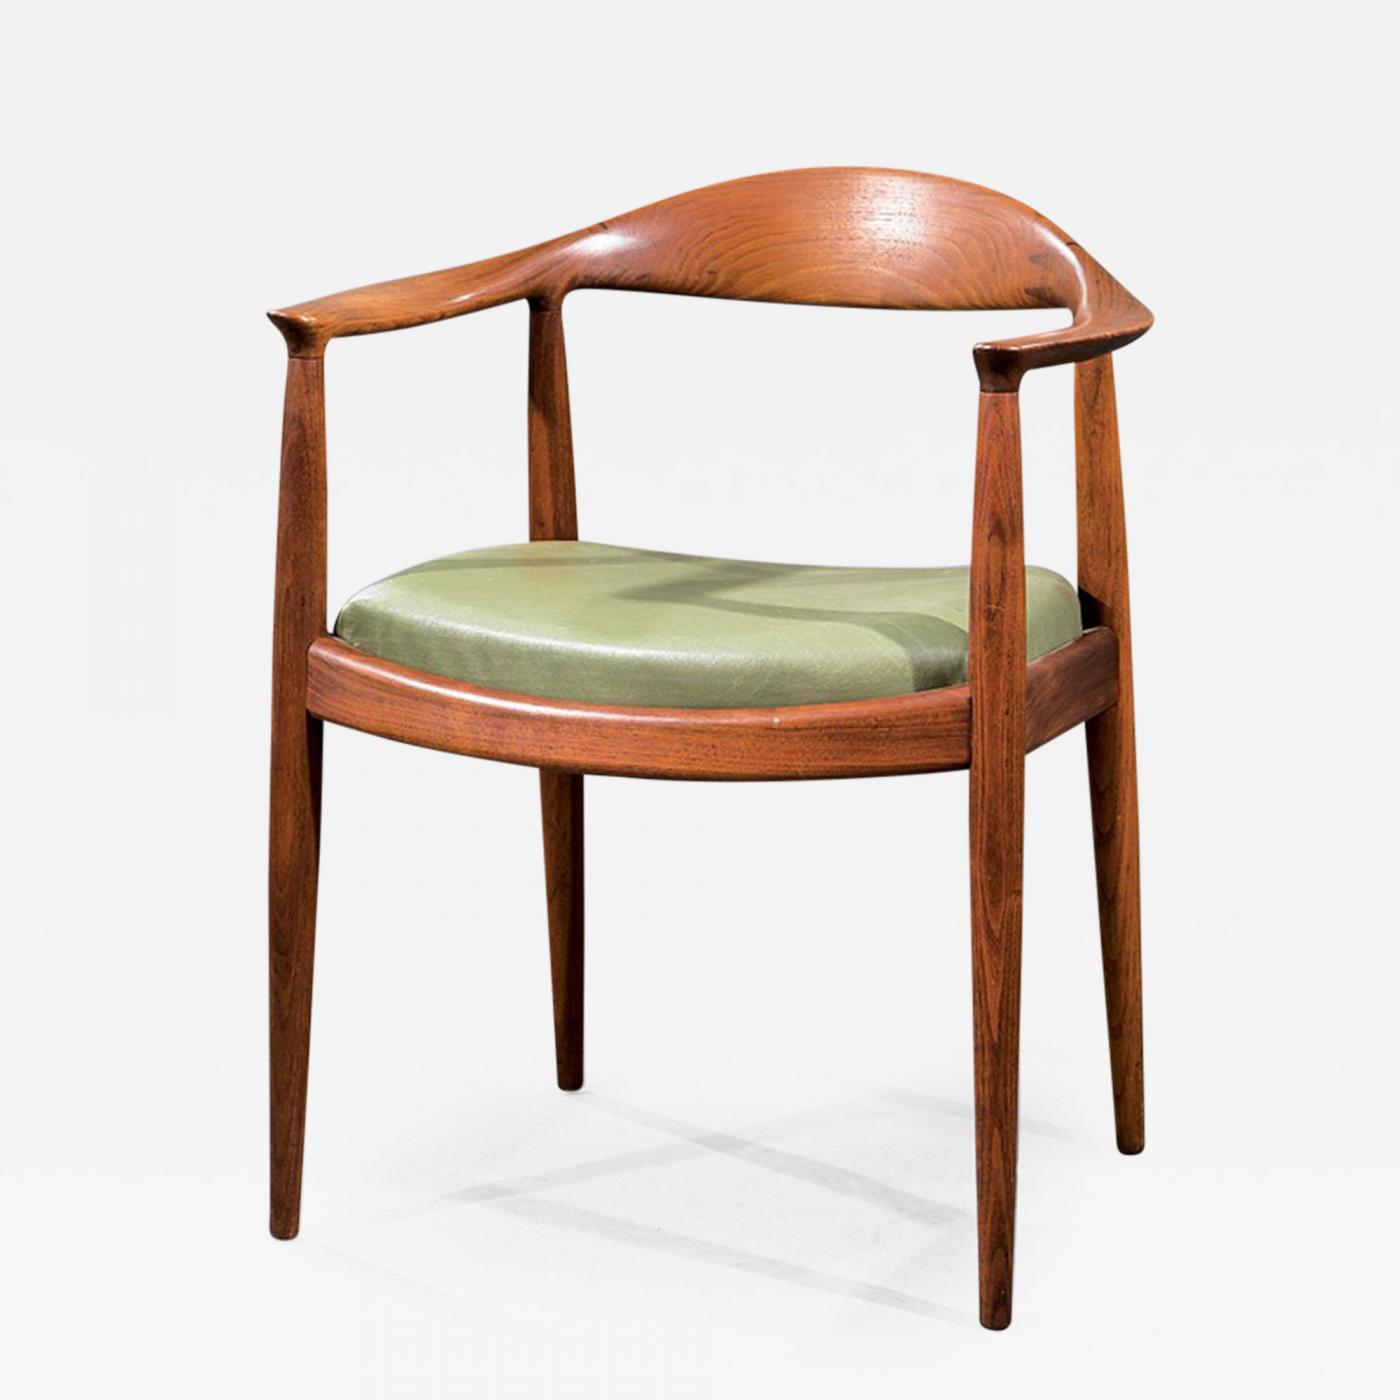 Hans Wegner - A Vintage Danish Teak Armchair by Hans Wegner